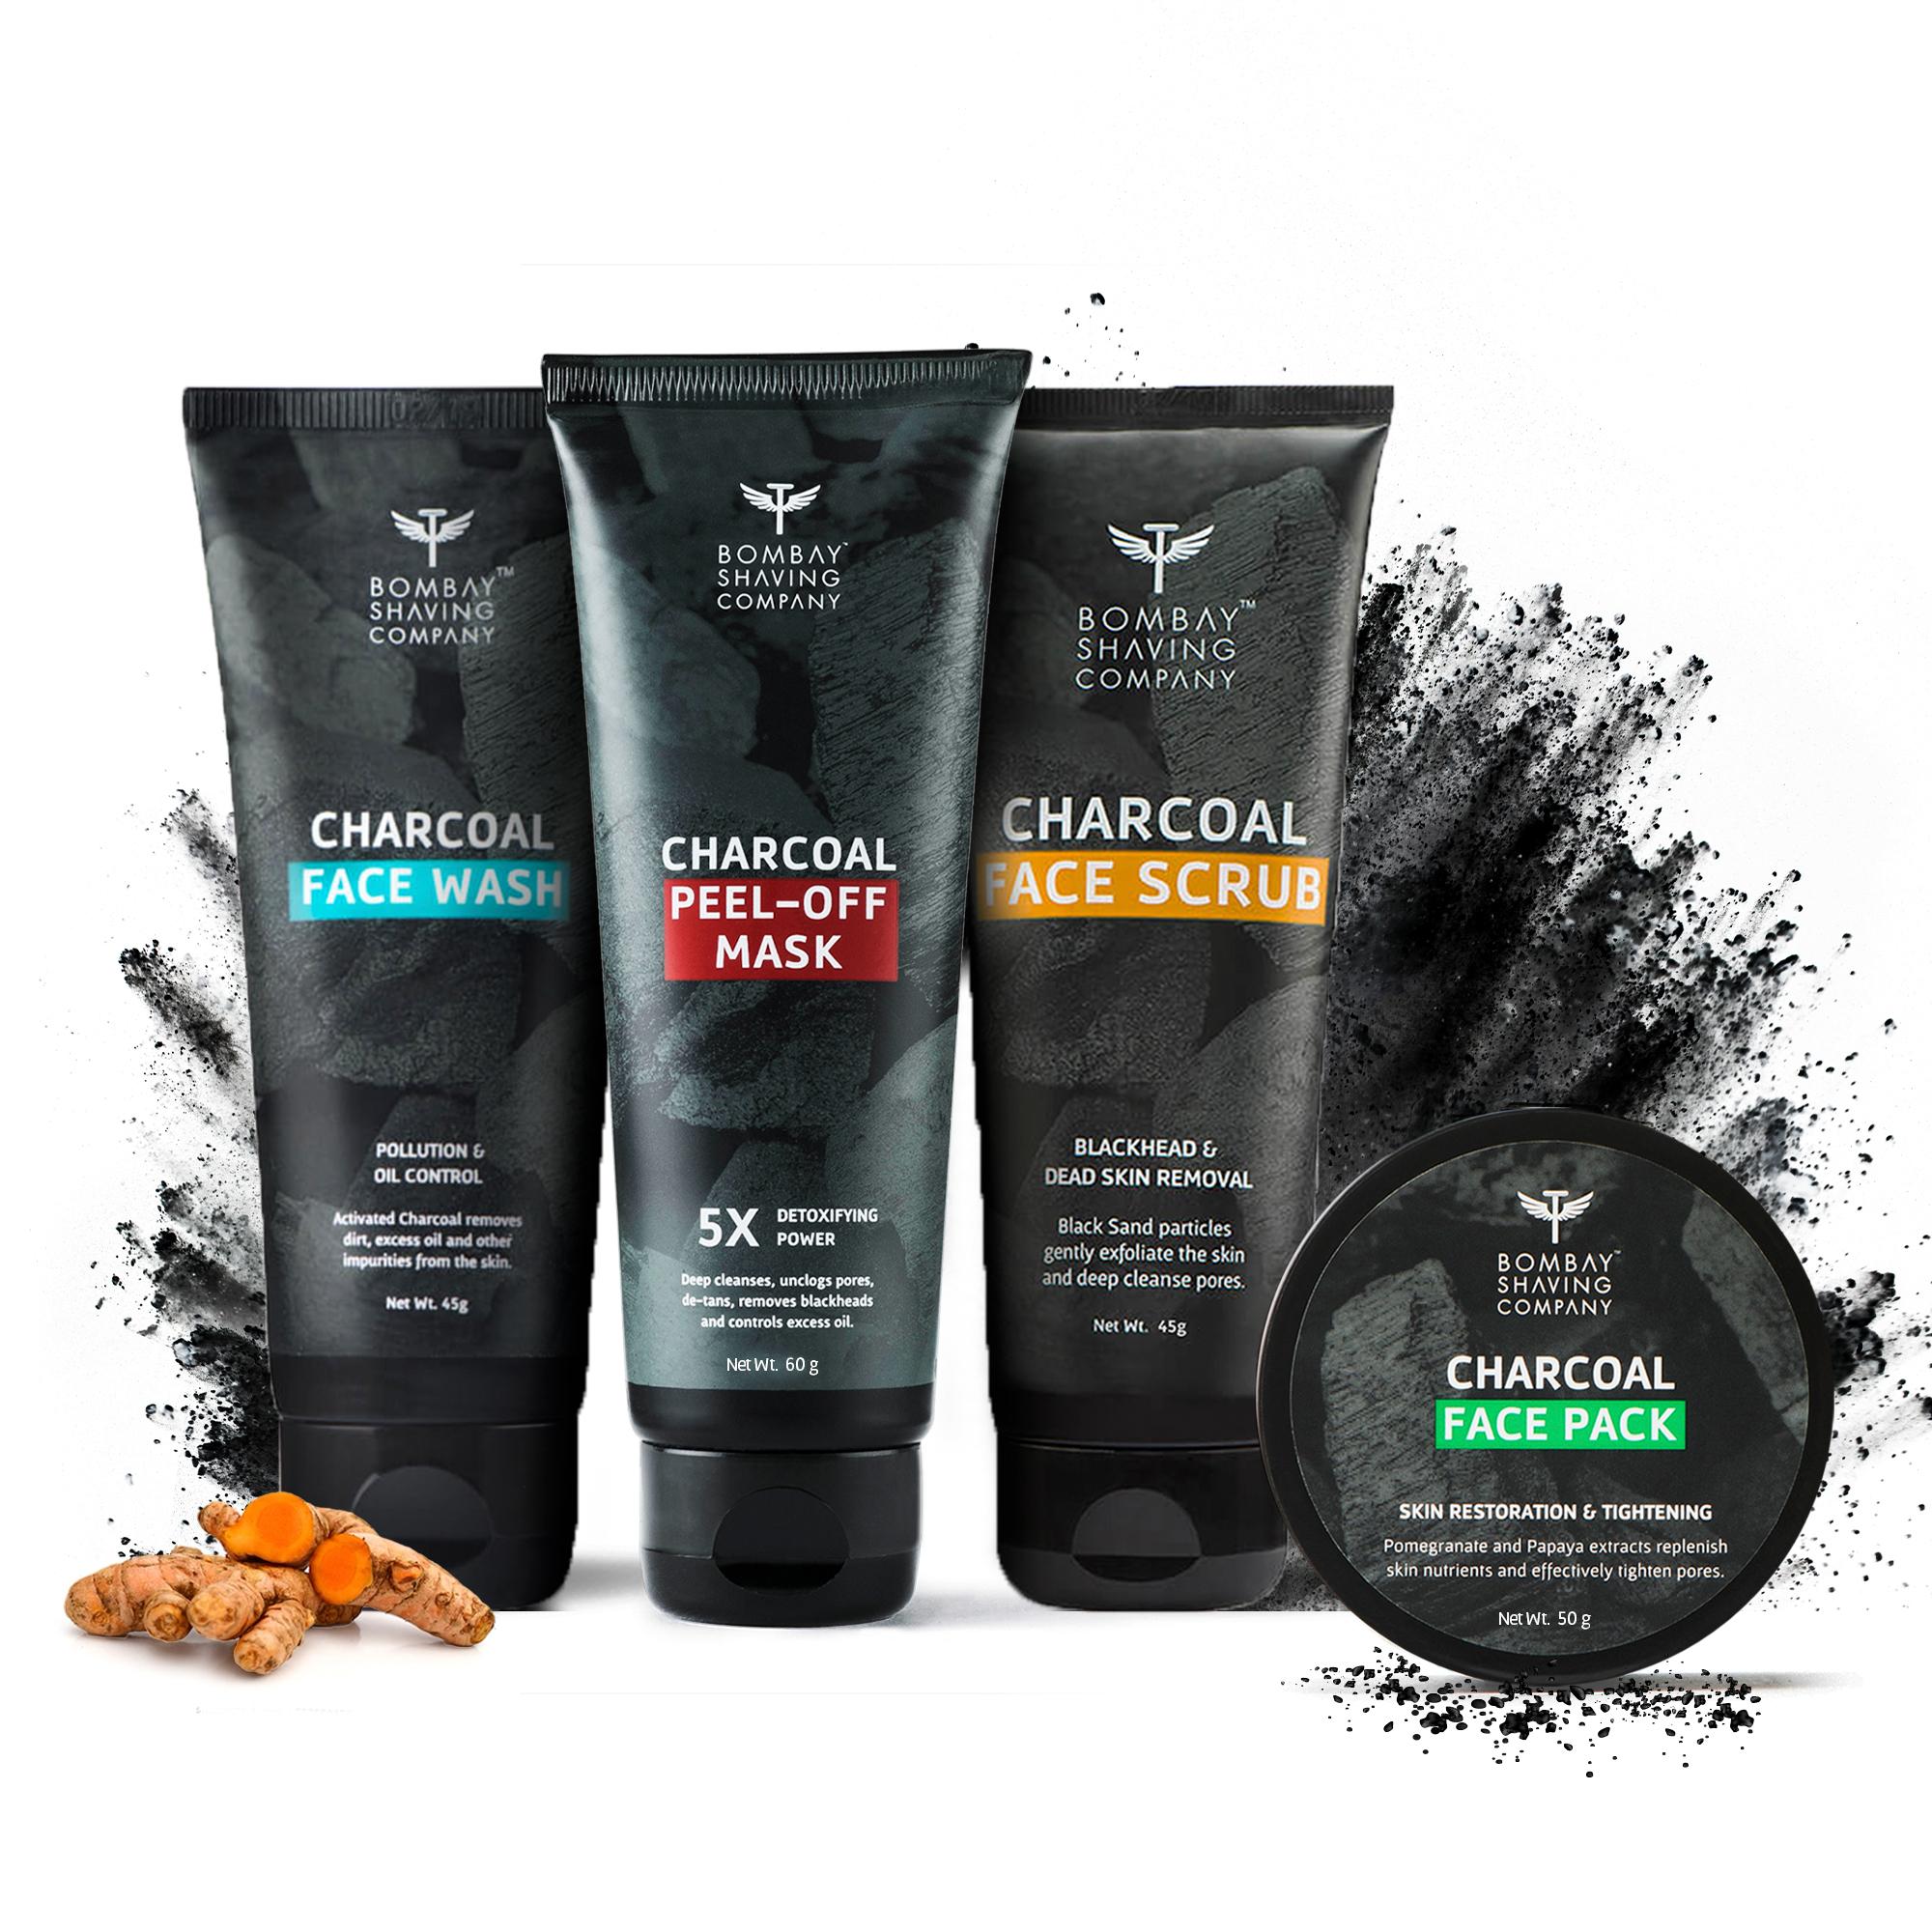 Bombay Shaving Company |  Charcoal Facial Starter Kit, Black, 200 g